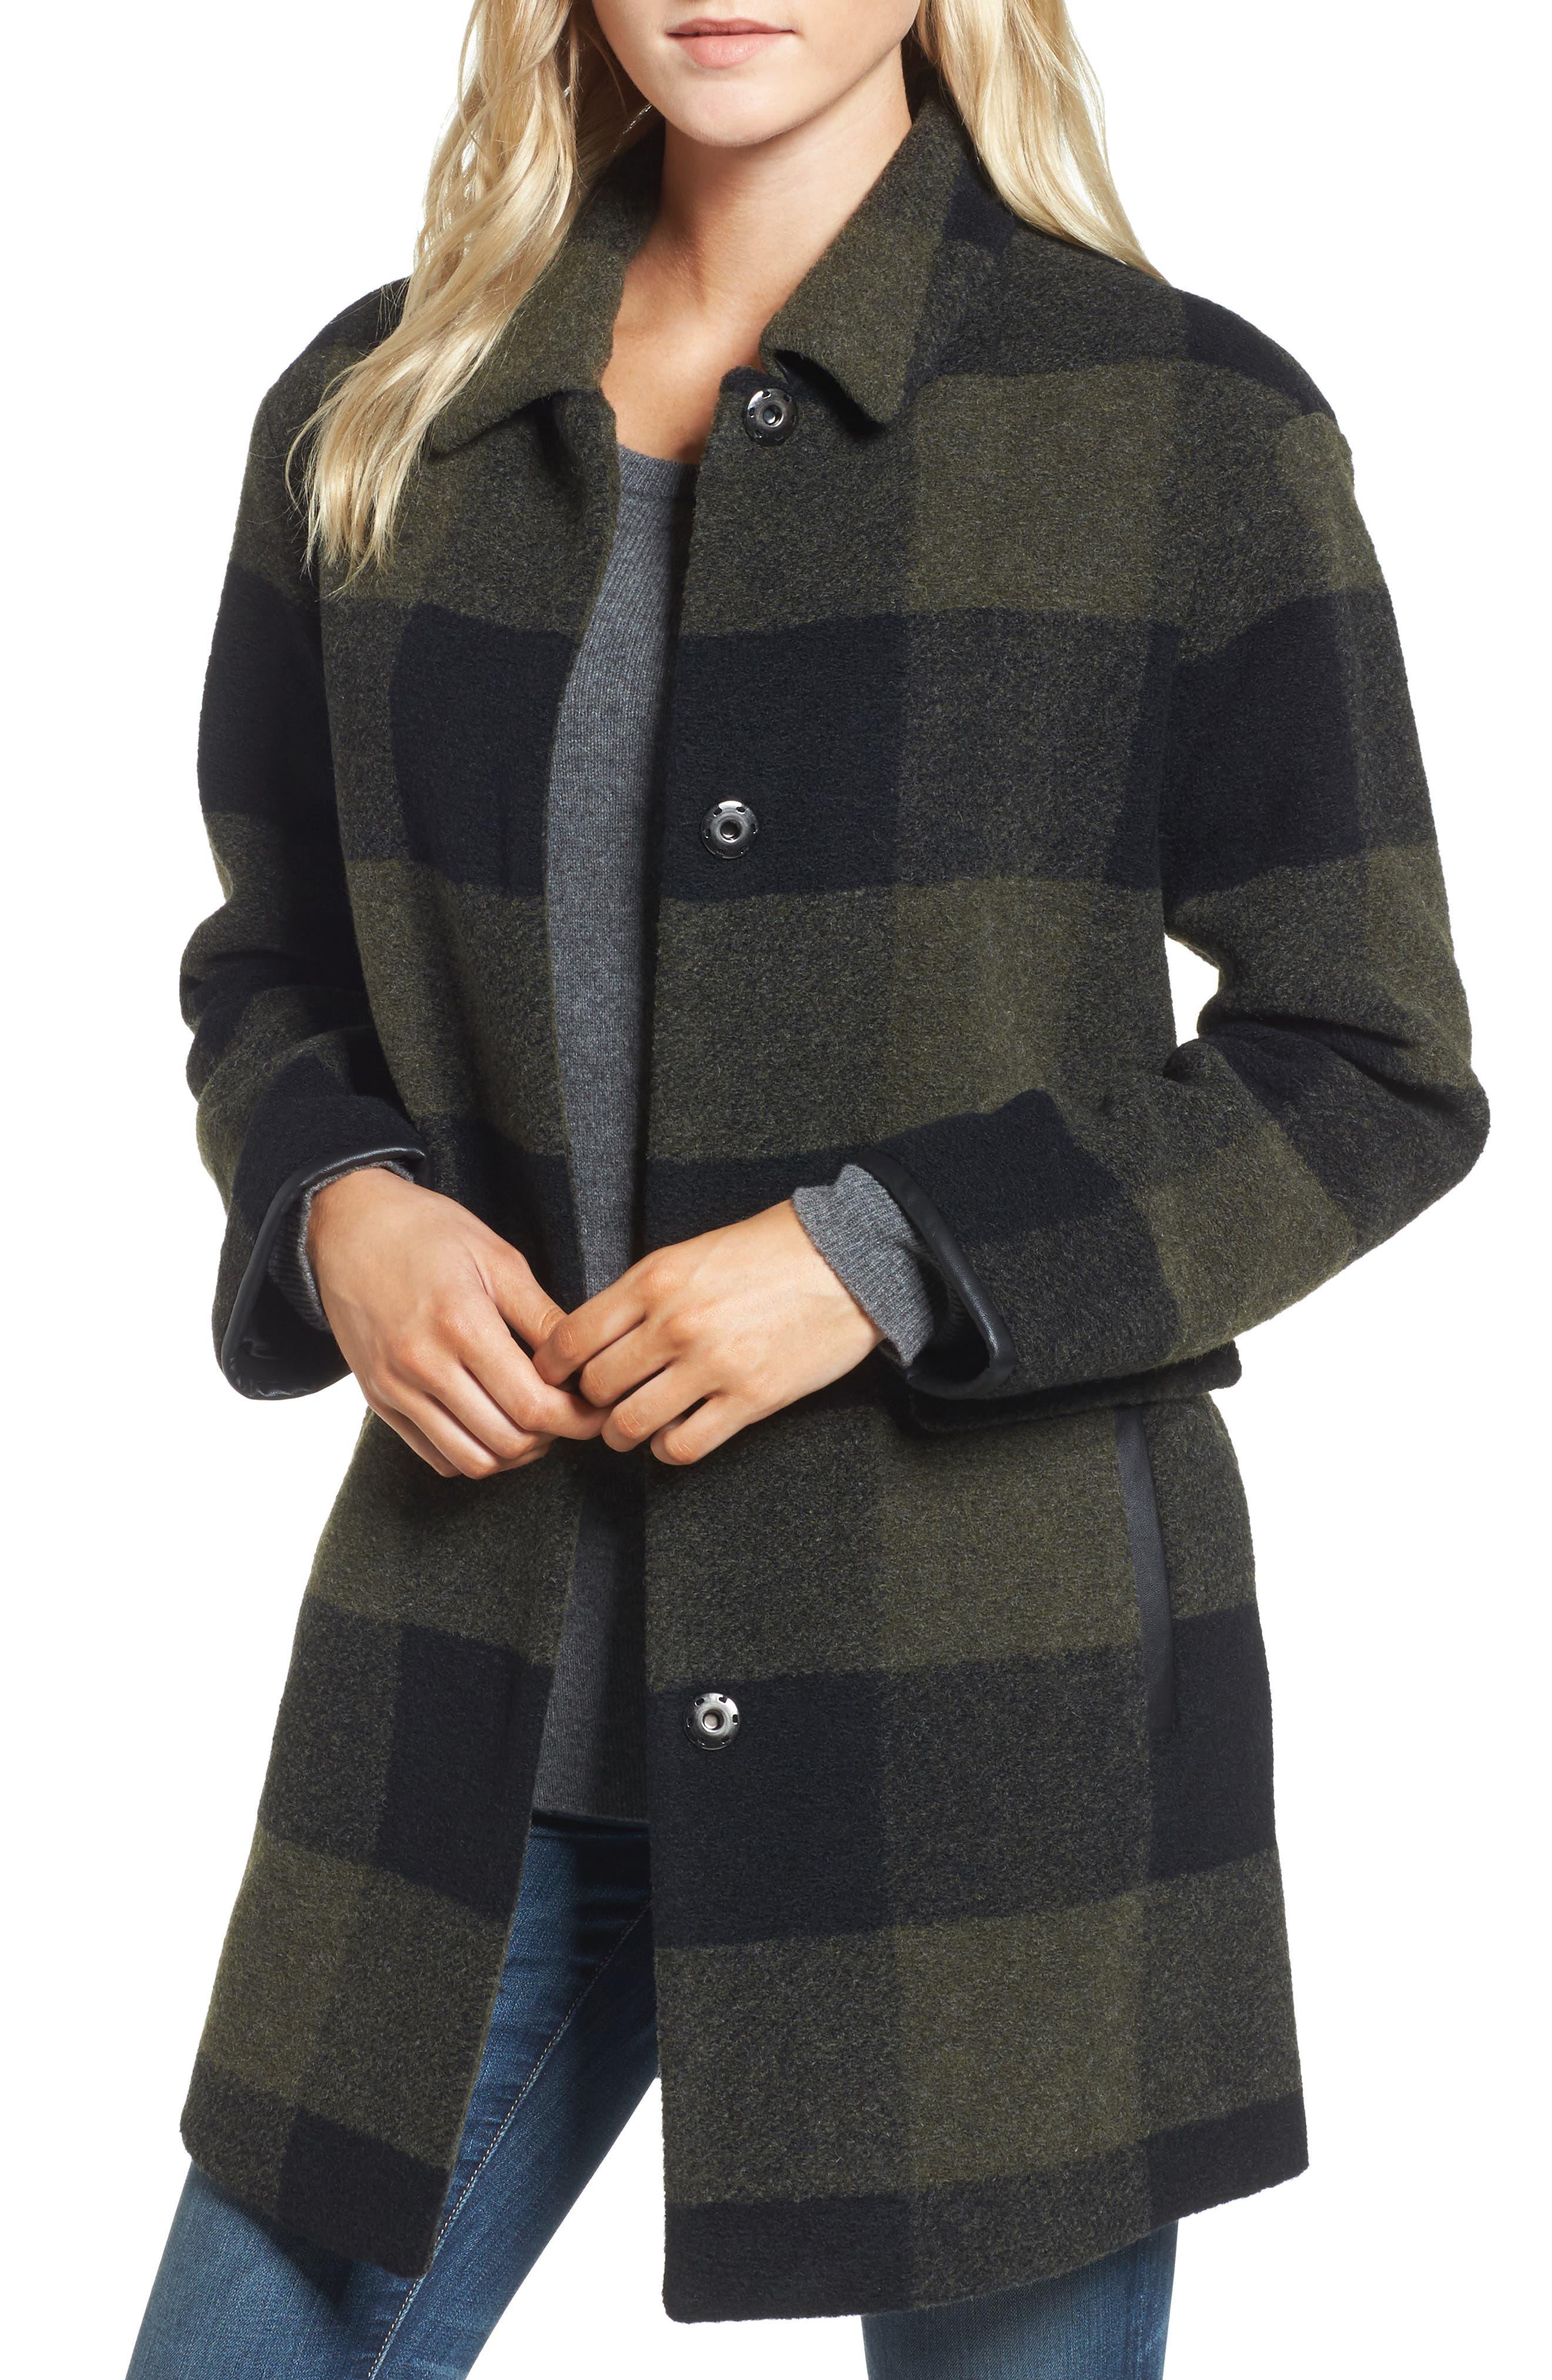 Paul Bunyan Plaid Wool Blend Barn Coat,                         Main,                         color, 342